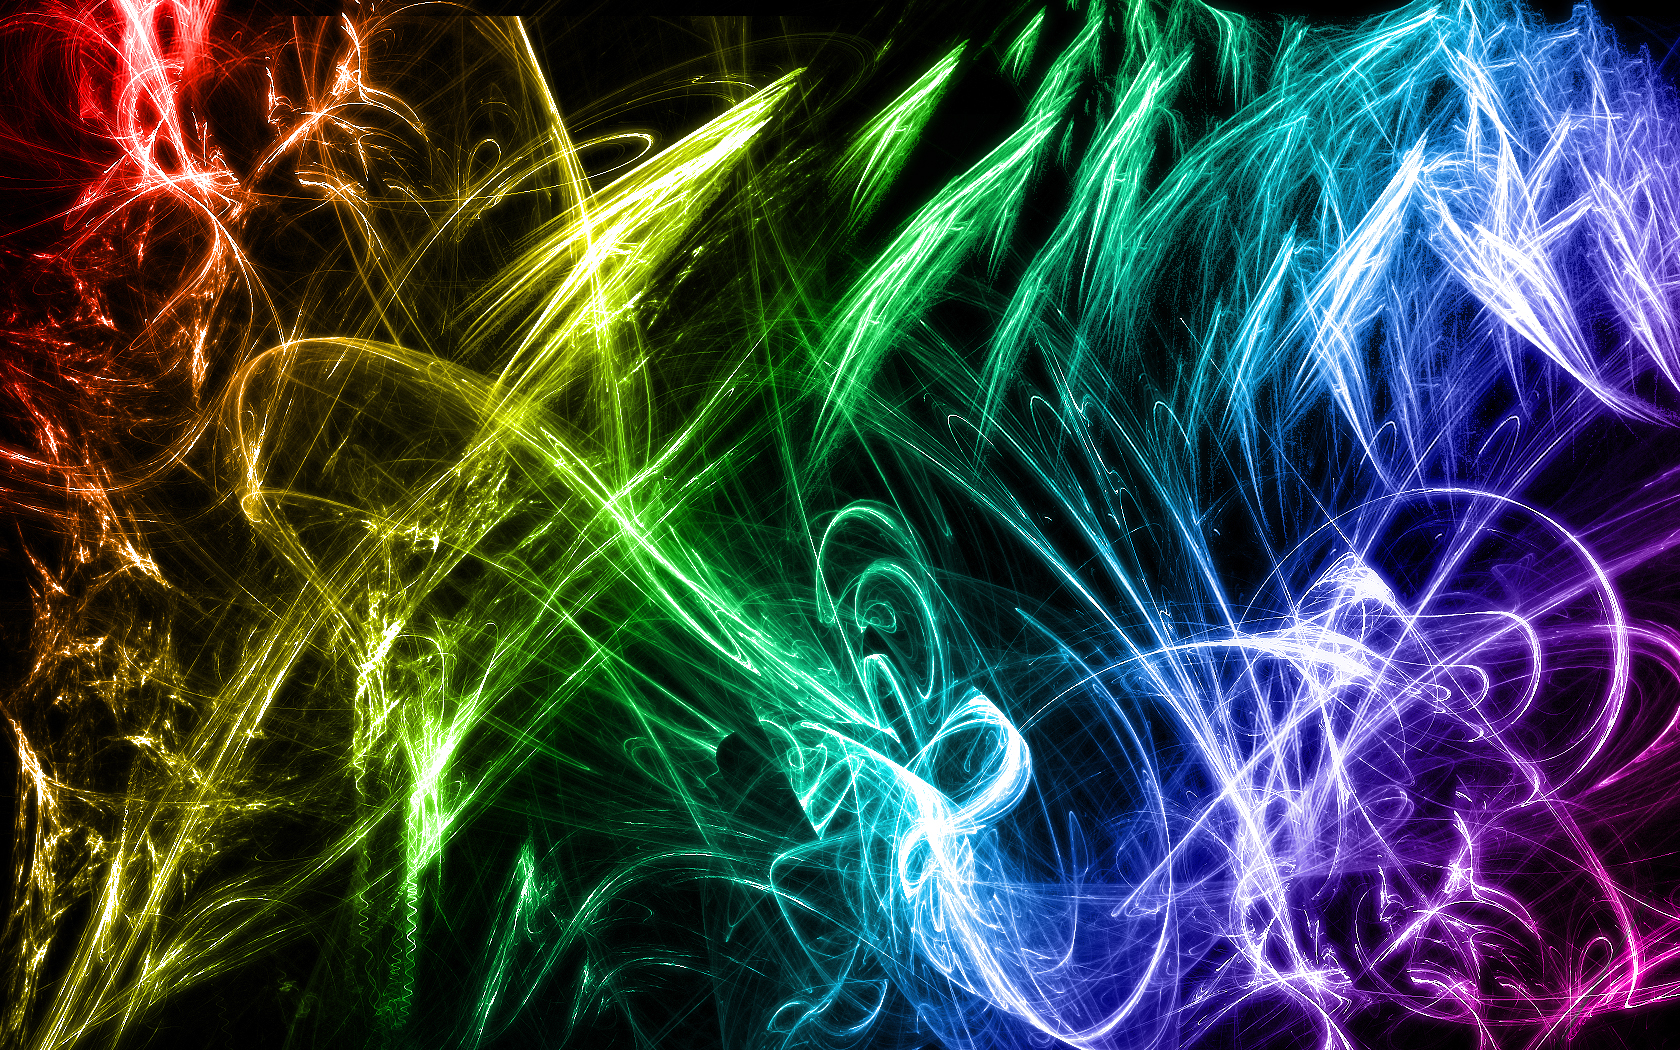 Cool Computer Wallpapers Desktop Backgrounds 1680x1050 ID66068 1680x1050